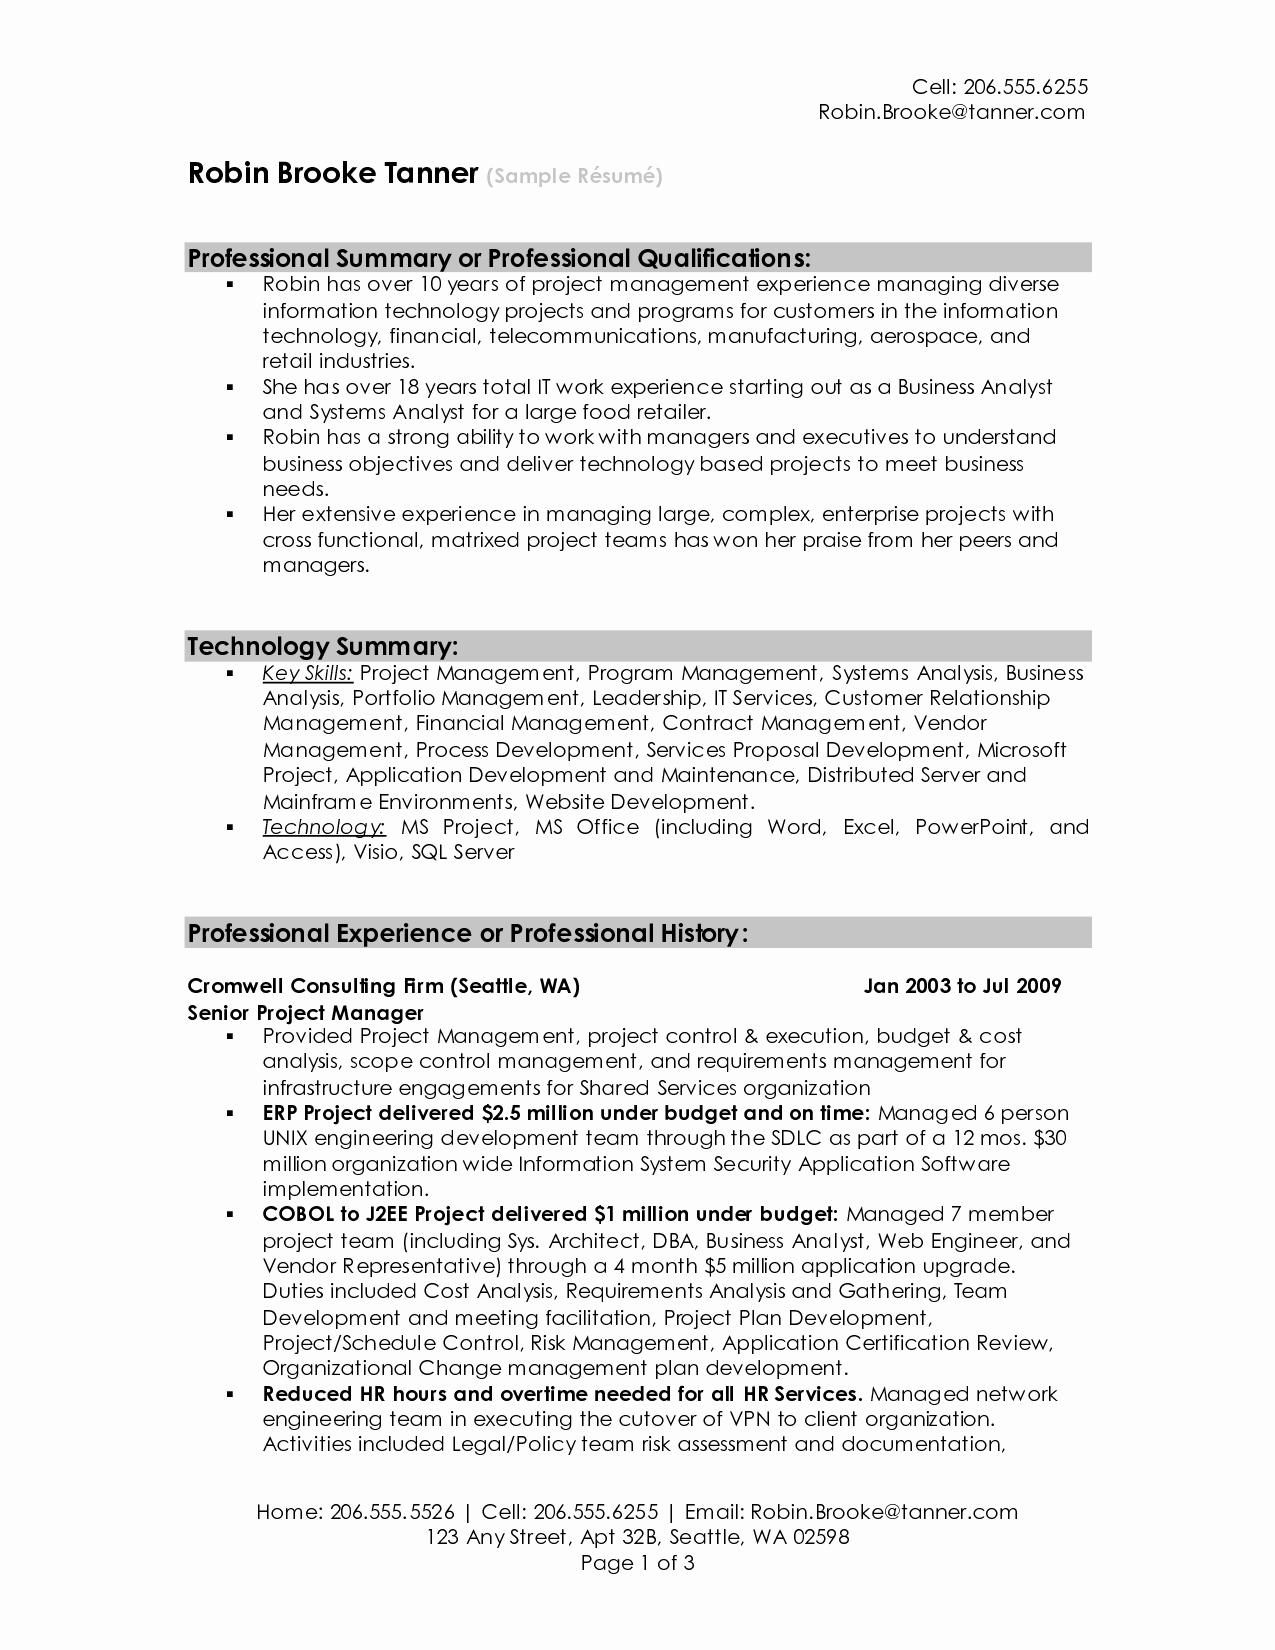 Best Resume Samples 2016